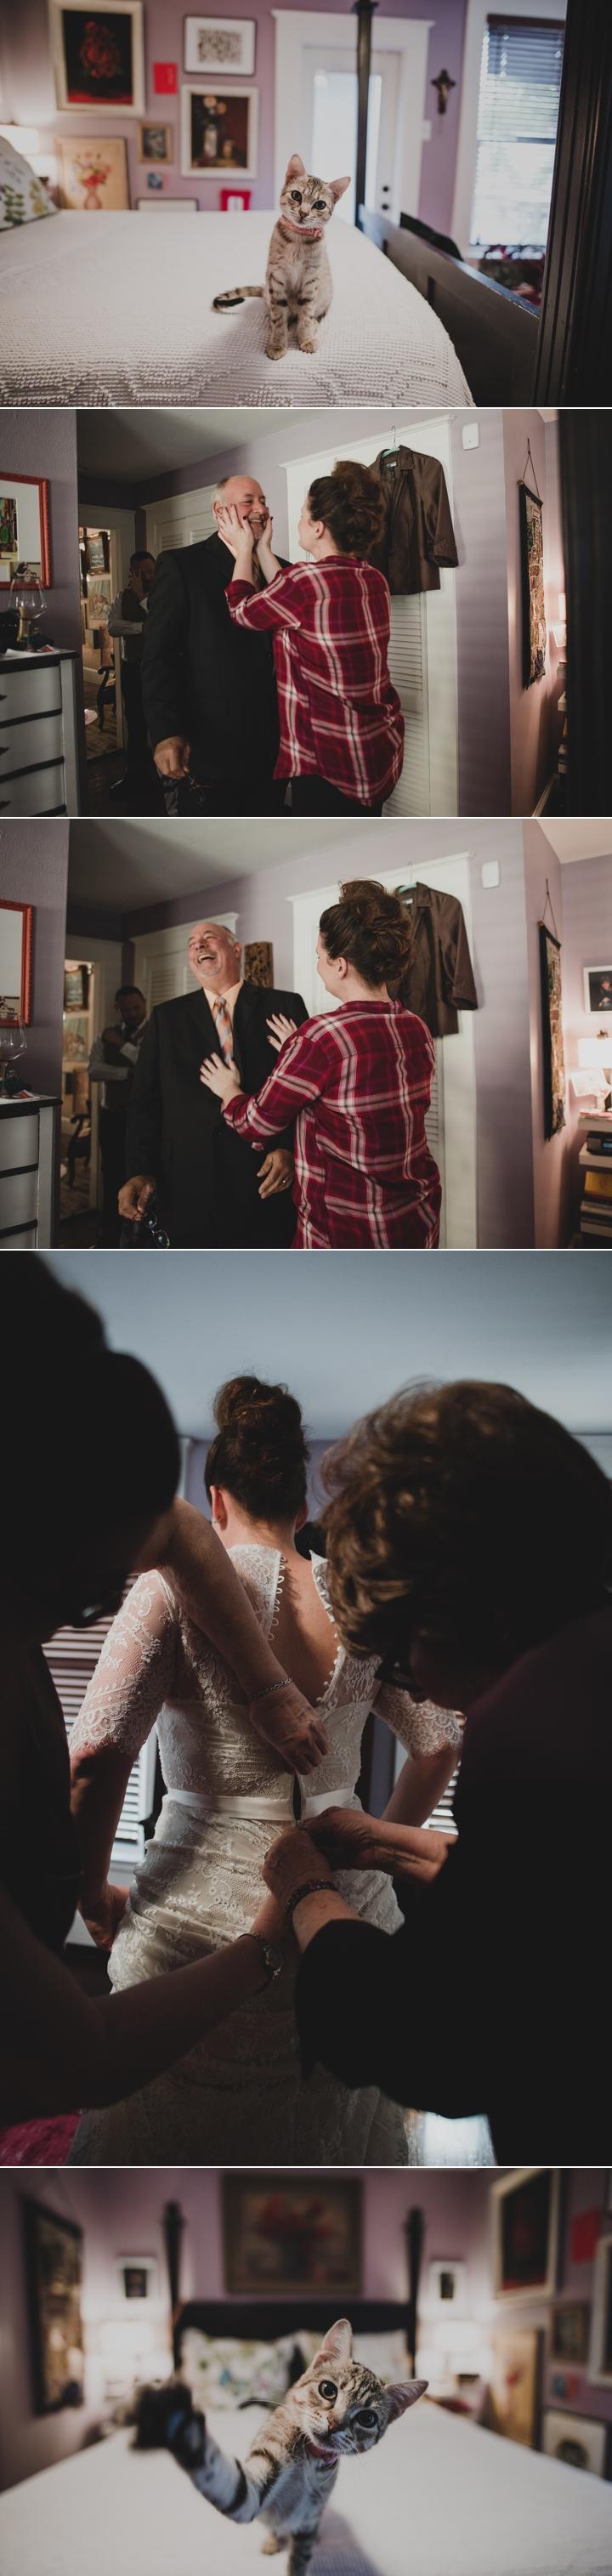 dallas-wedding-photographers-jp 6.jpg